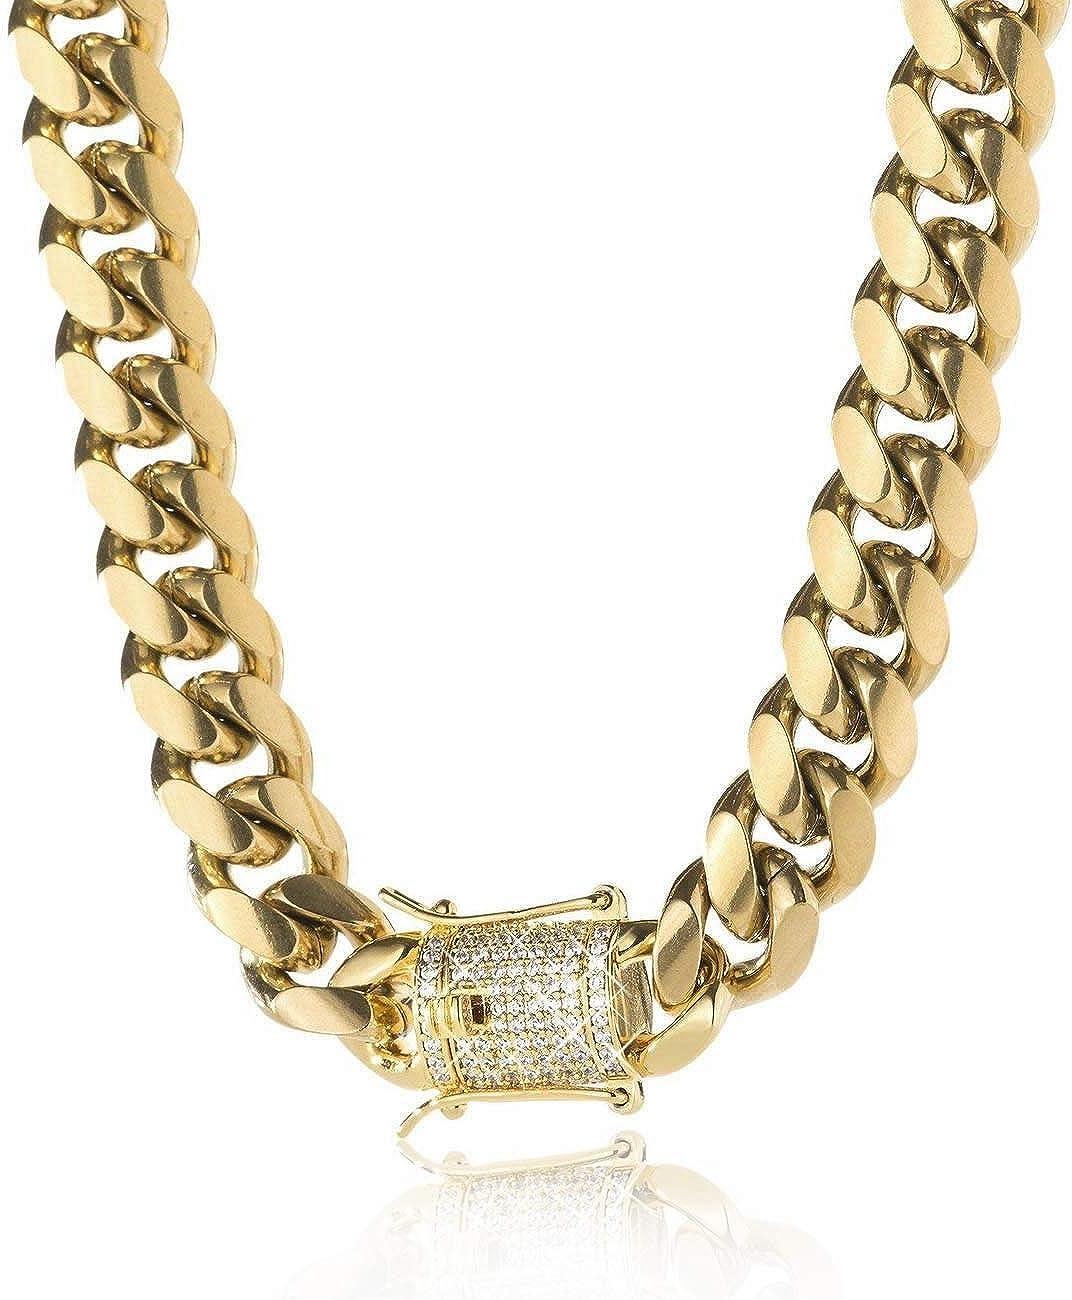 Max 55% OFF shipfree TRIPOD JEWELRY 14K Gold Plated Miami w Link Cuban Bracelet Chain